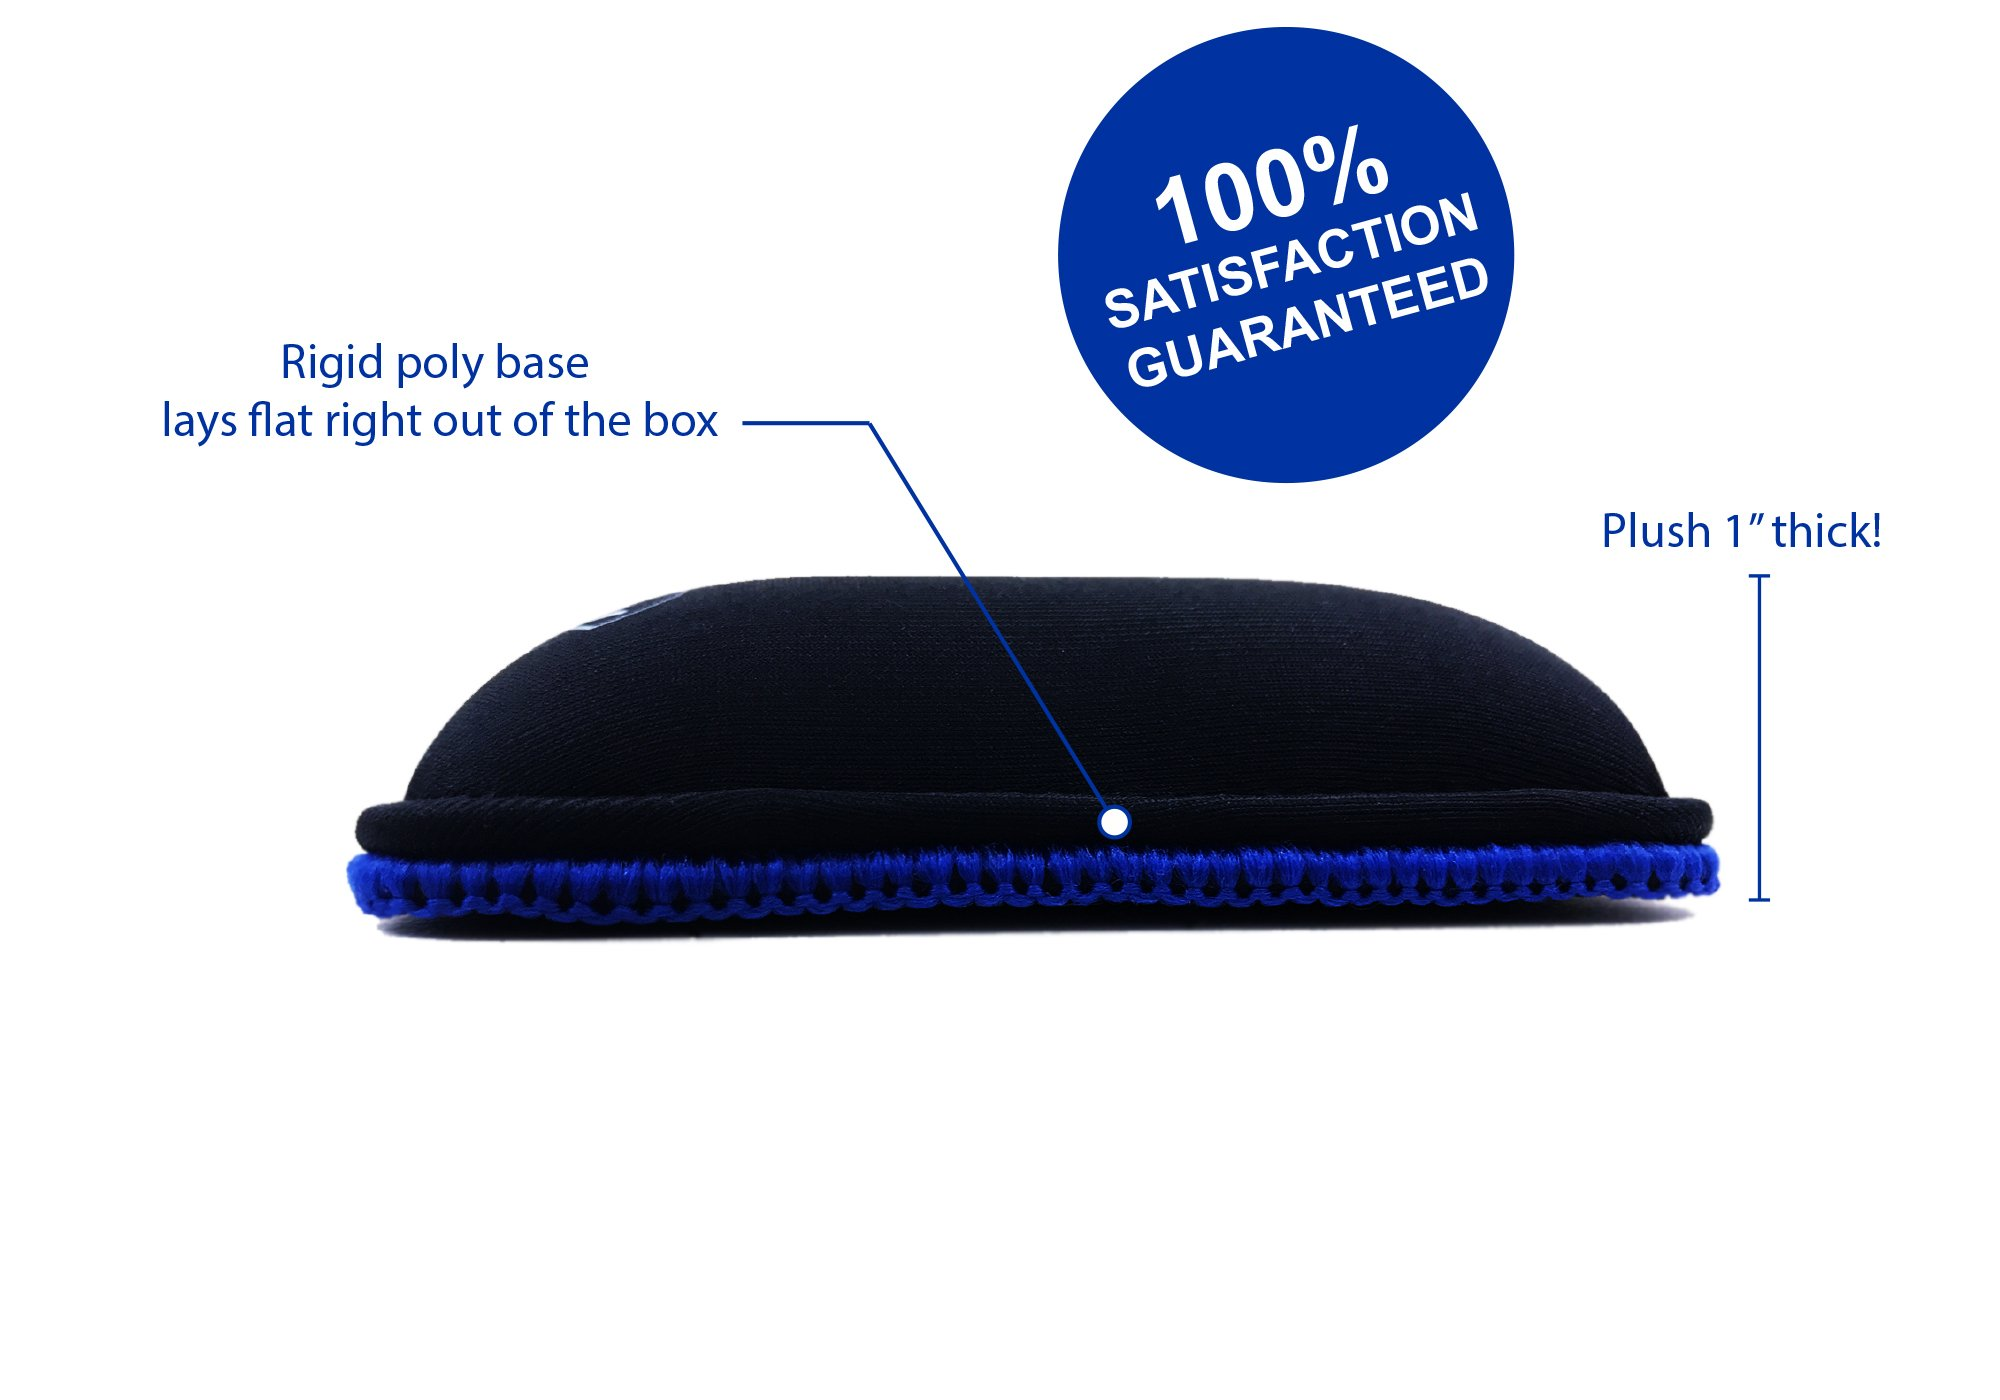 "XL Keyboard Wrist Rest/Wrist Pad, TENKEYLESS 14.5"" Long x 4"" Wide x 1"" Thick Padded Water Resistant, Ergonomic Memory Foam Gel, Anti-Fray Stitched Edges, Anti-Slip Rubber Base, Black | by Metratonic by Metratonic (Image #4)"